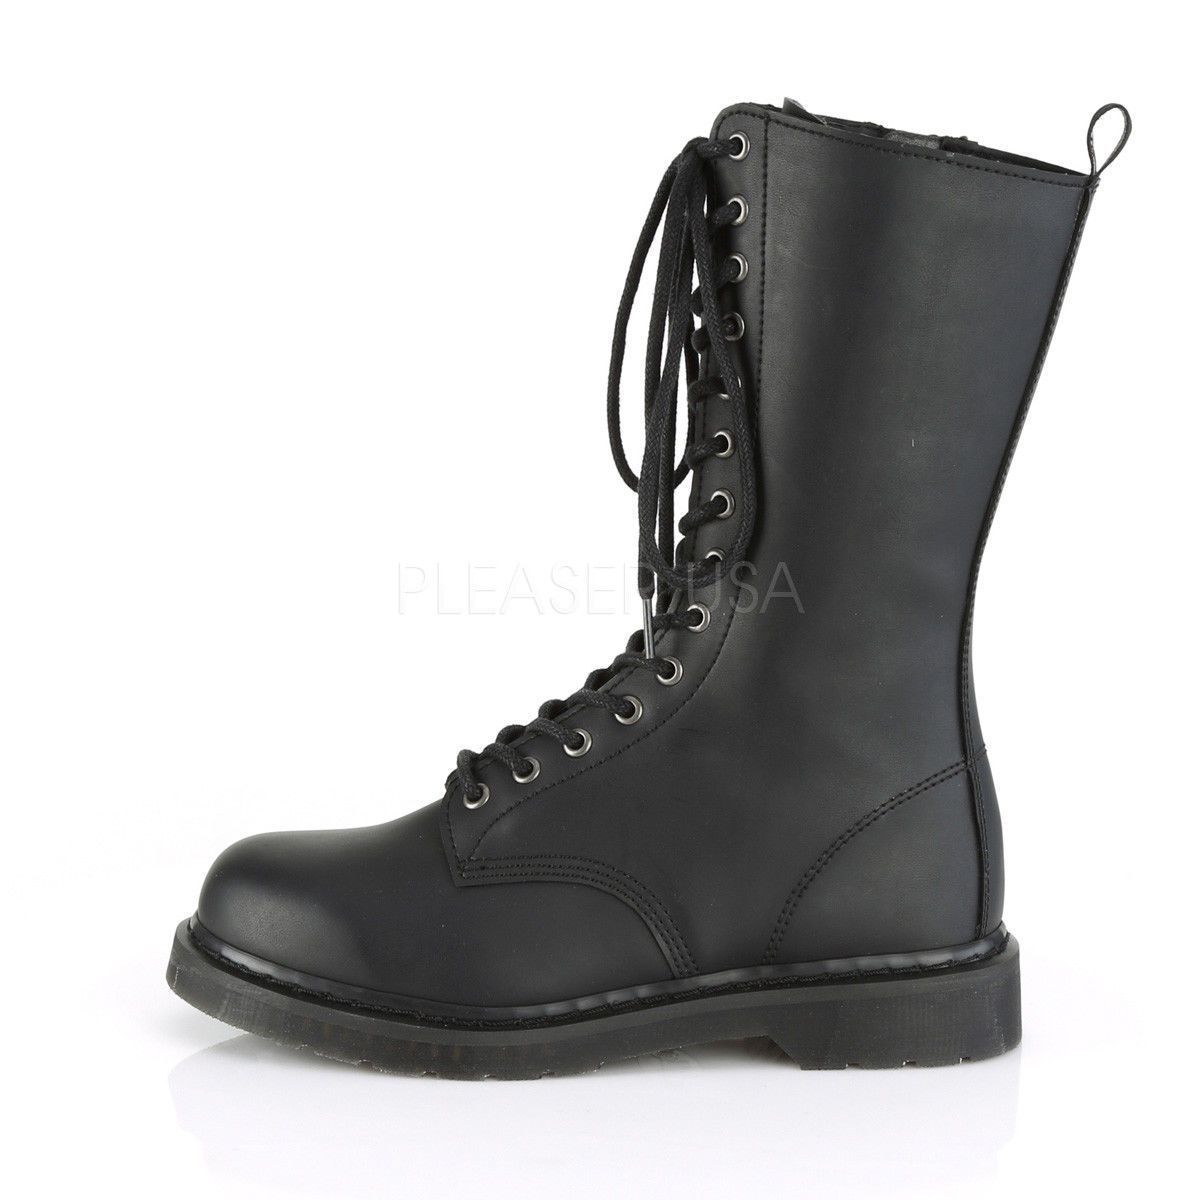 Bolt 300 Goth Combat Biker Boots Black Matte Men Sizes 4 14 Vegan Boots Boots Biker Boots